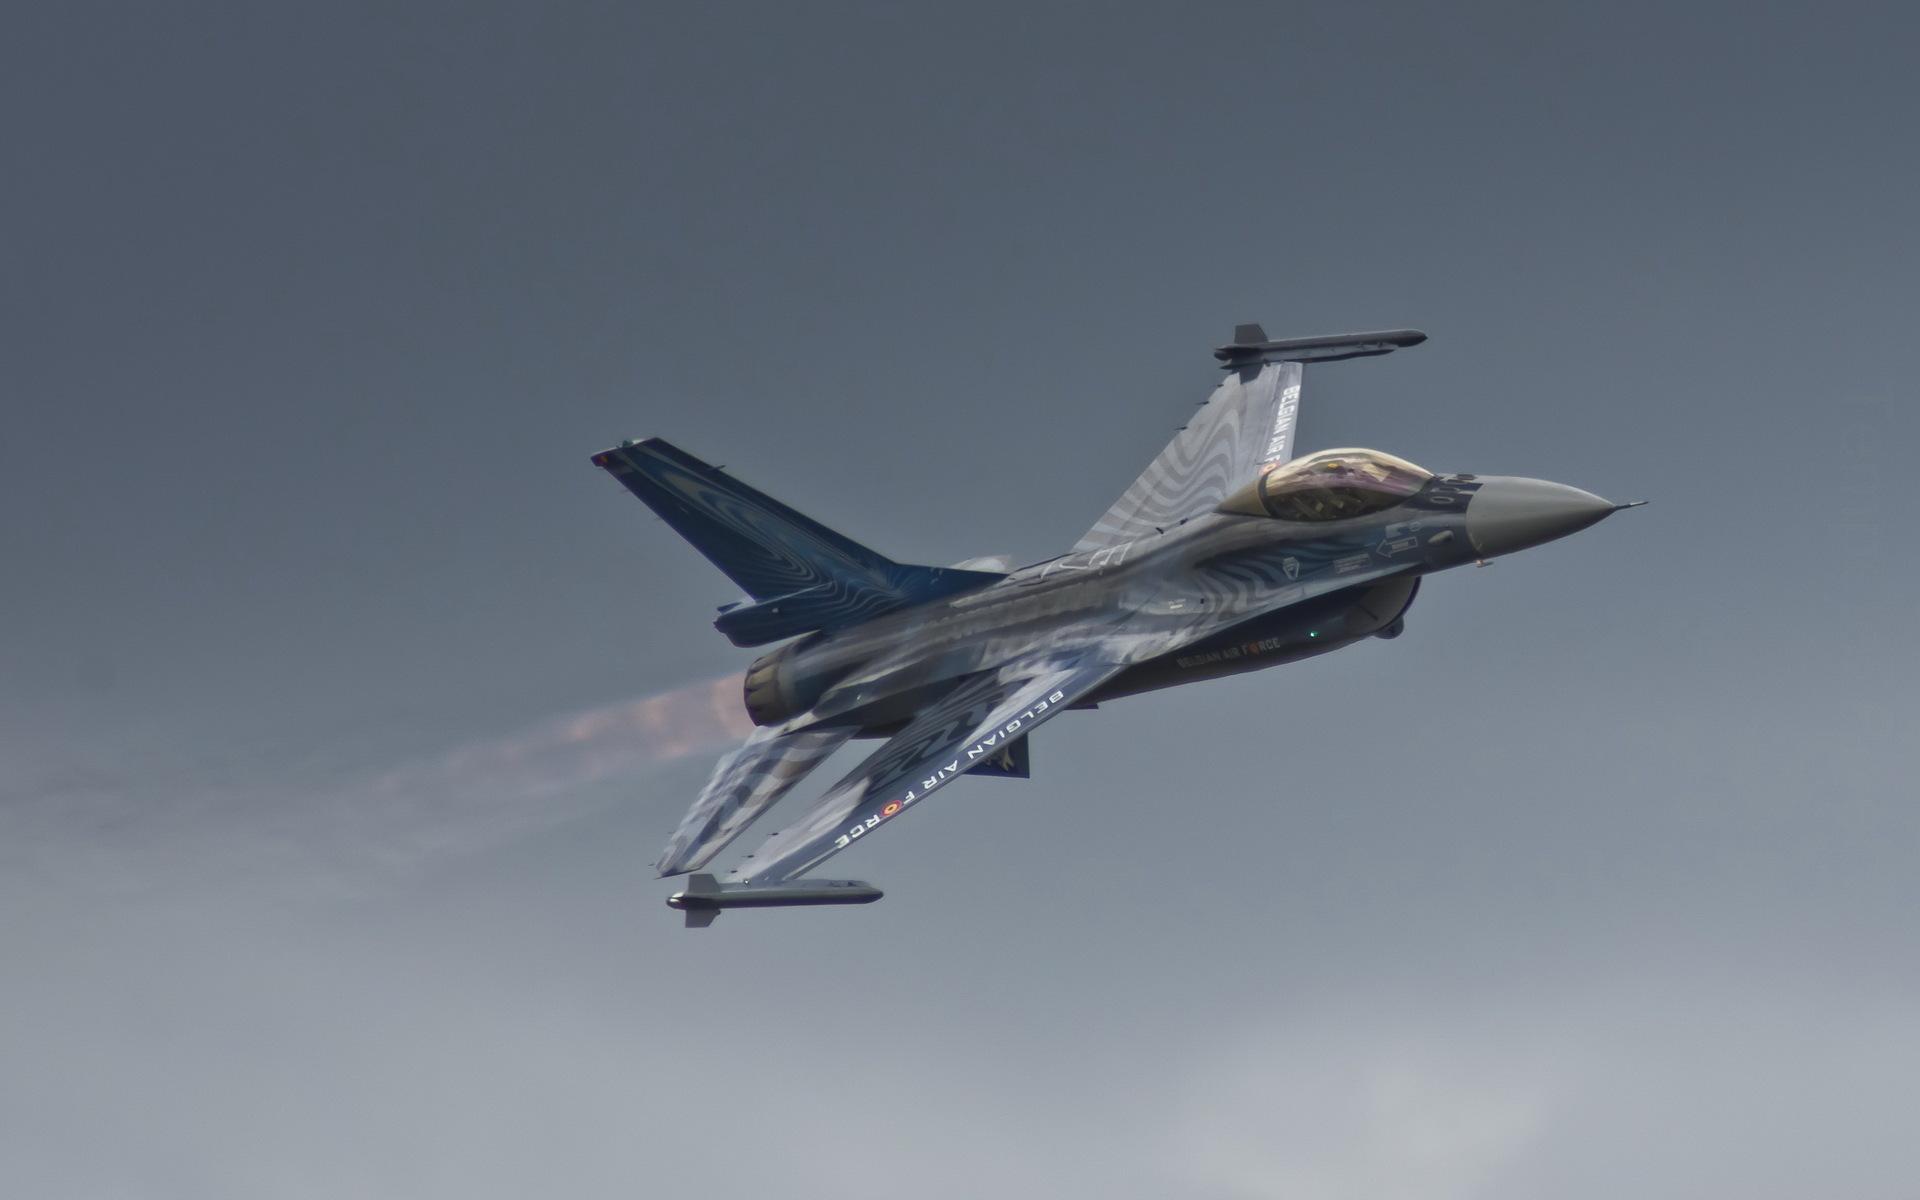 General Dynamics F 16 Fighting Falcon Hd Wallpaper: F-16 Fighting Falcon HD Wallpaper